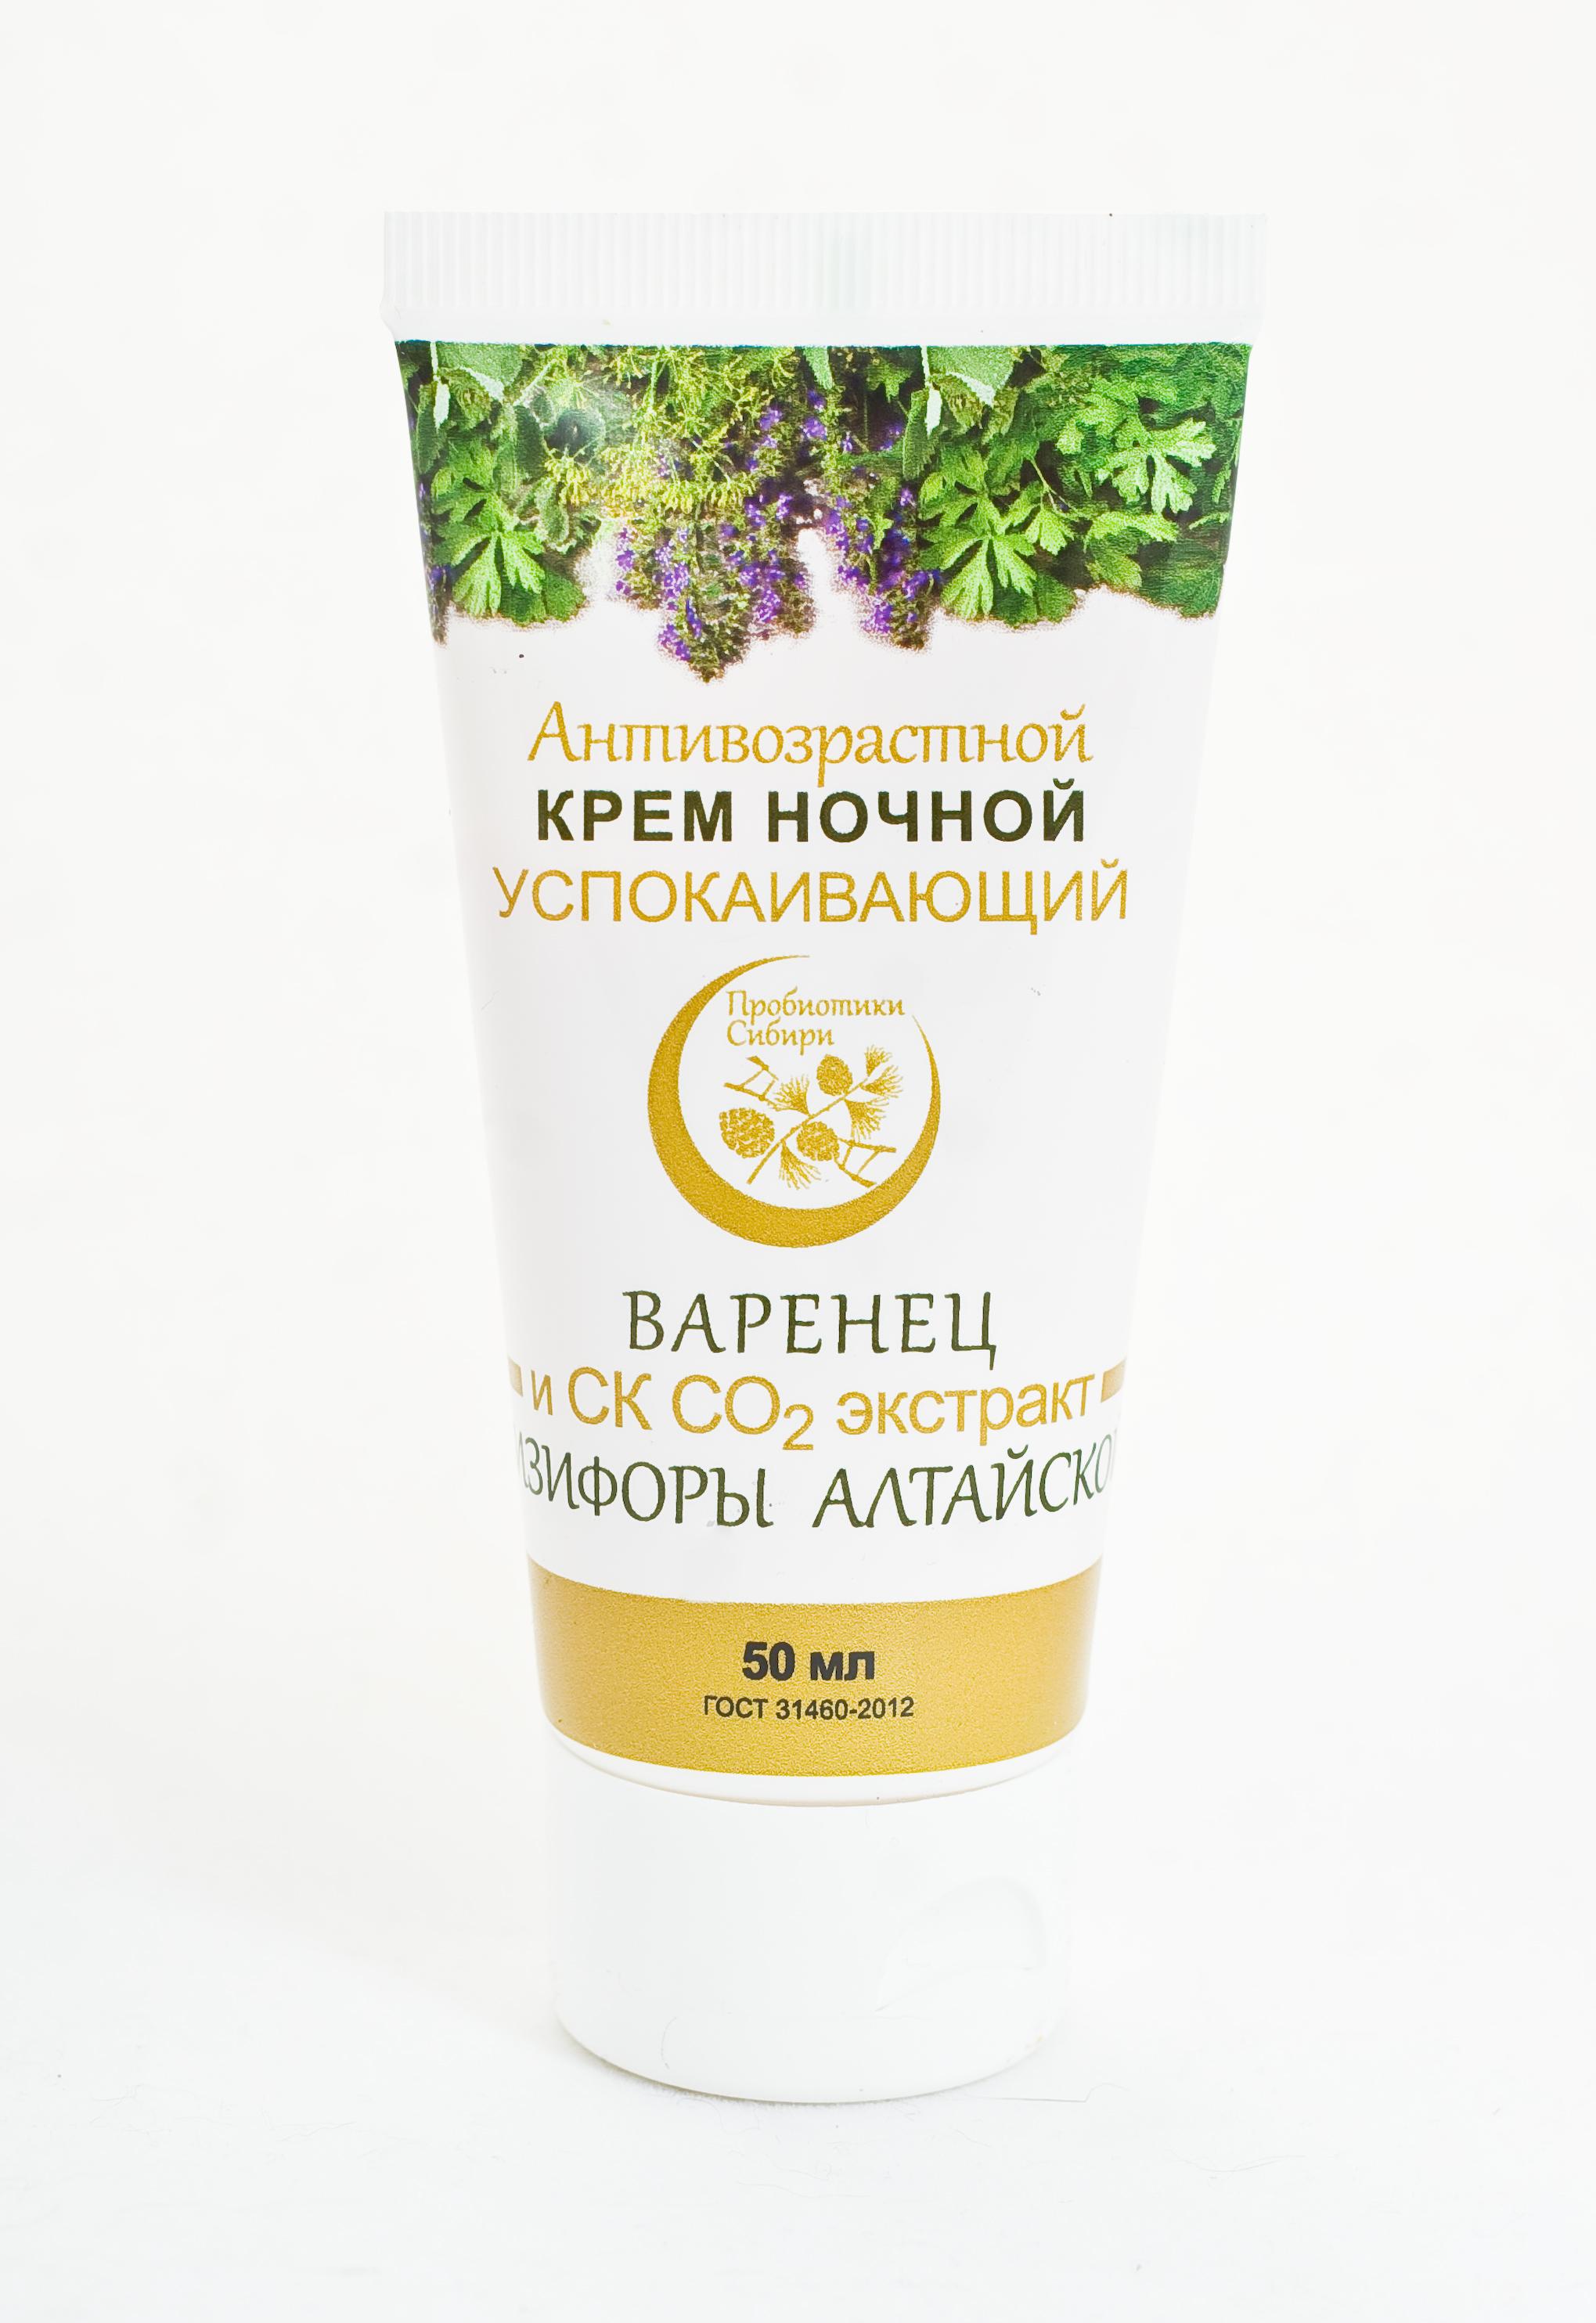 Крем для ухода за кожей Пробиотики Сибири 980042 Пробиотики Сибири